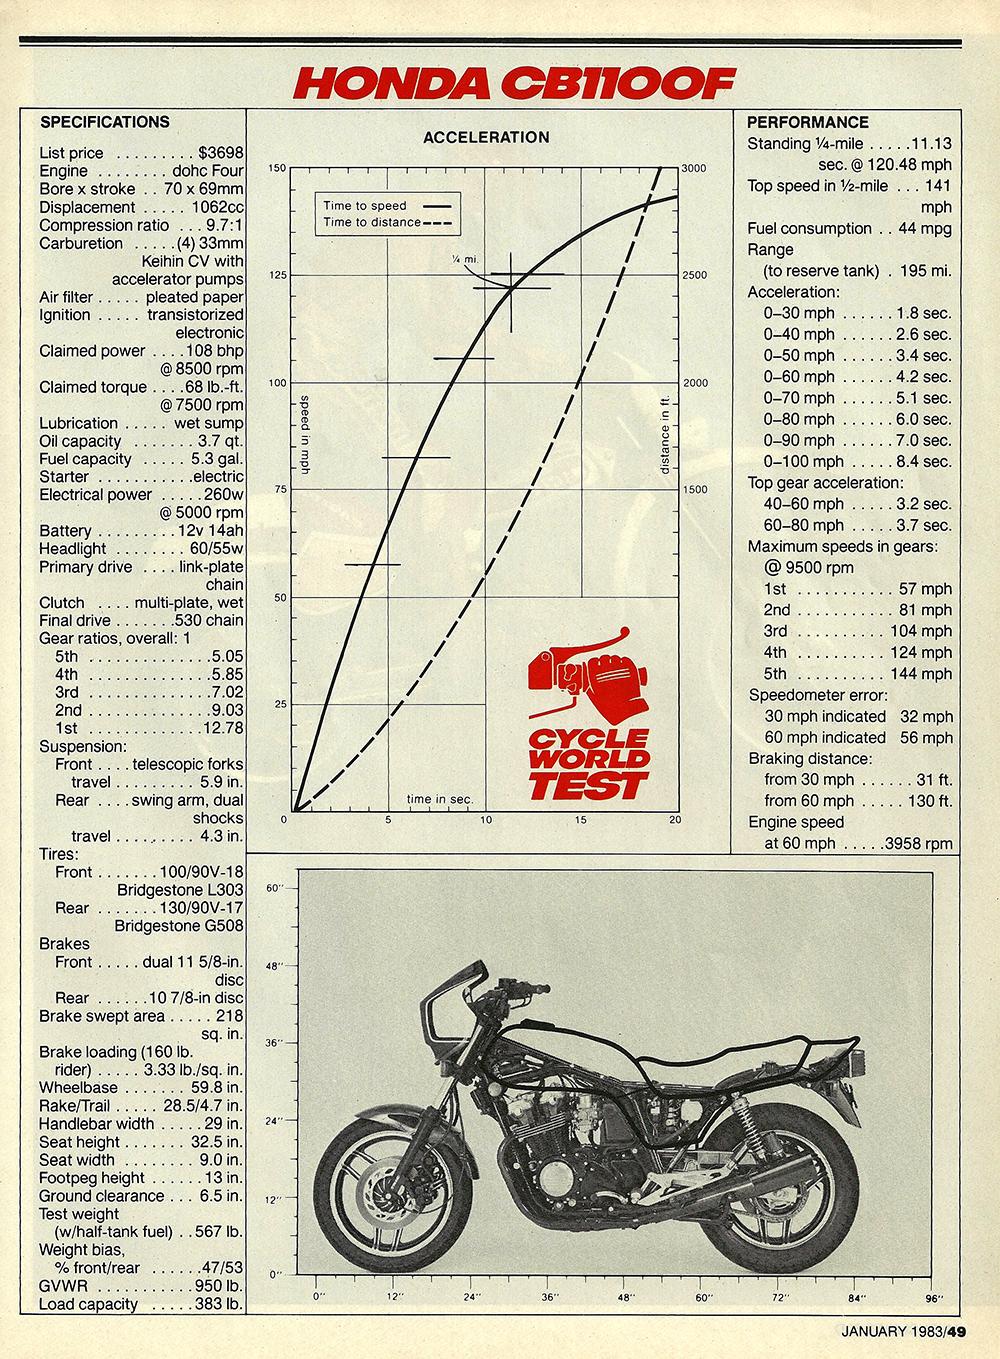 1983 Honda CB1100F road test 06.jpg